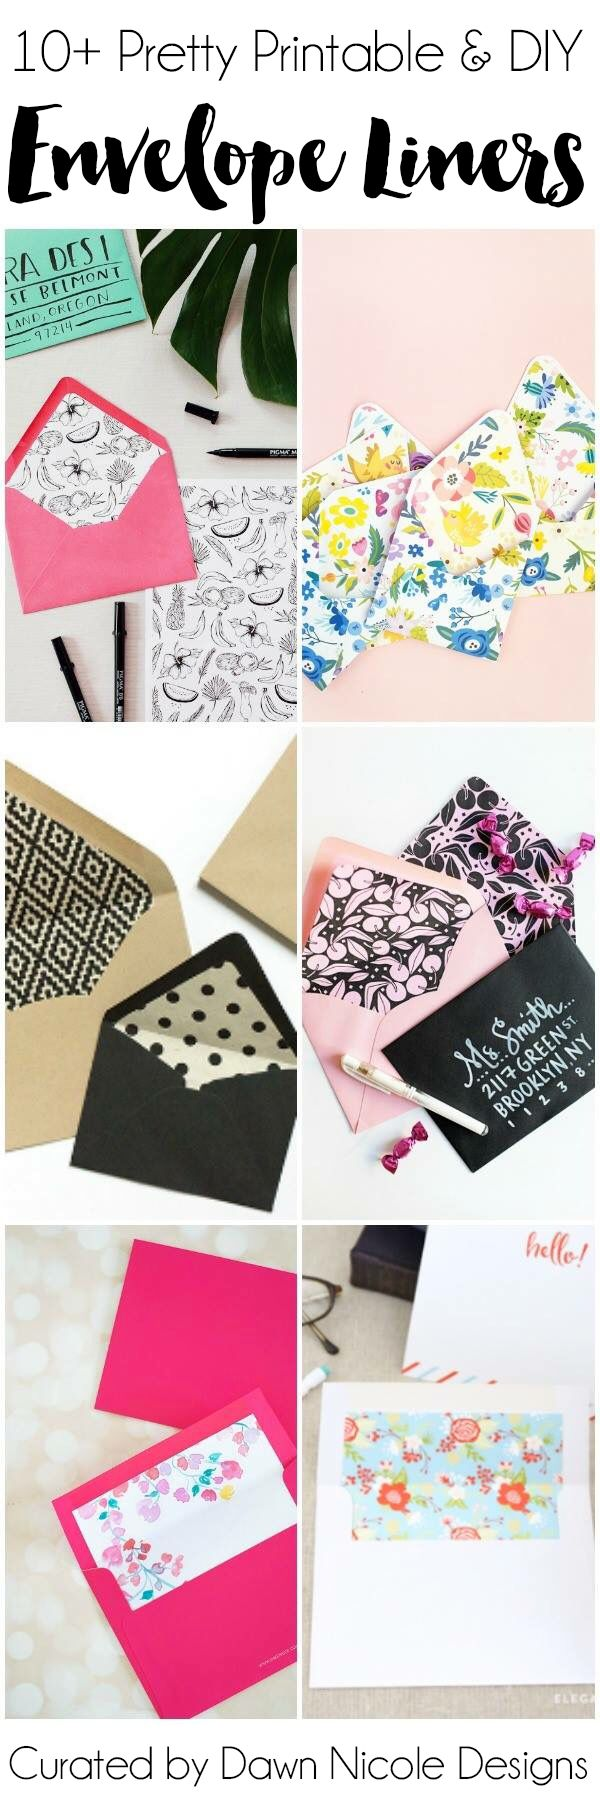 10+ Pretty Printable & DIY Envelope Liners | dawnnicoledesigns.com